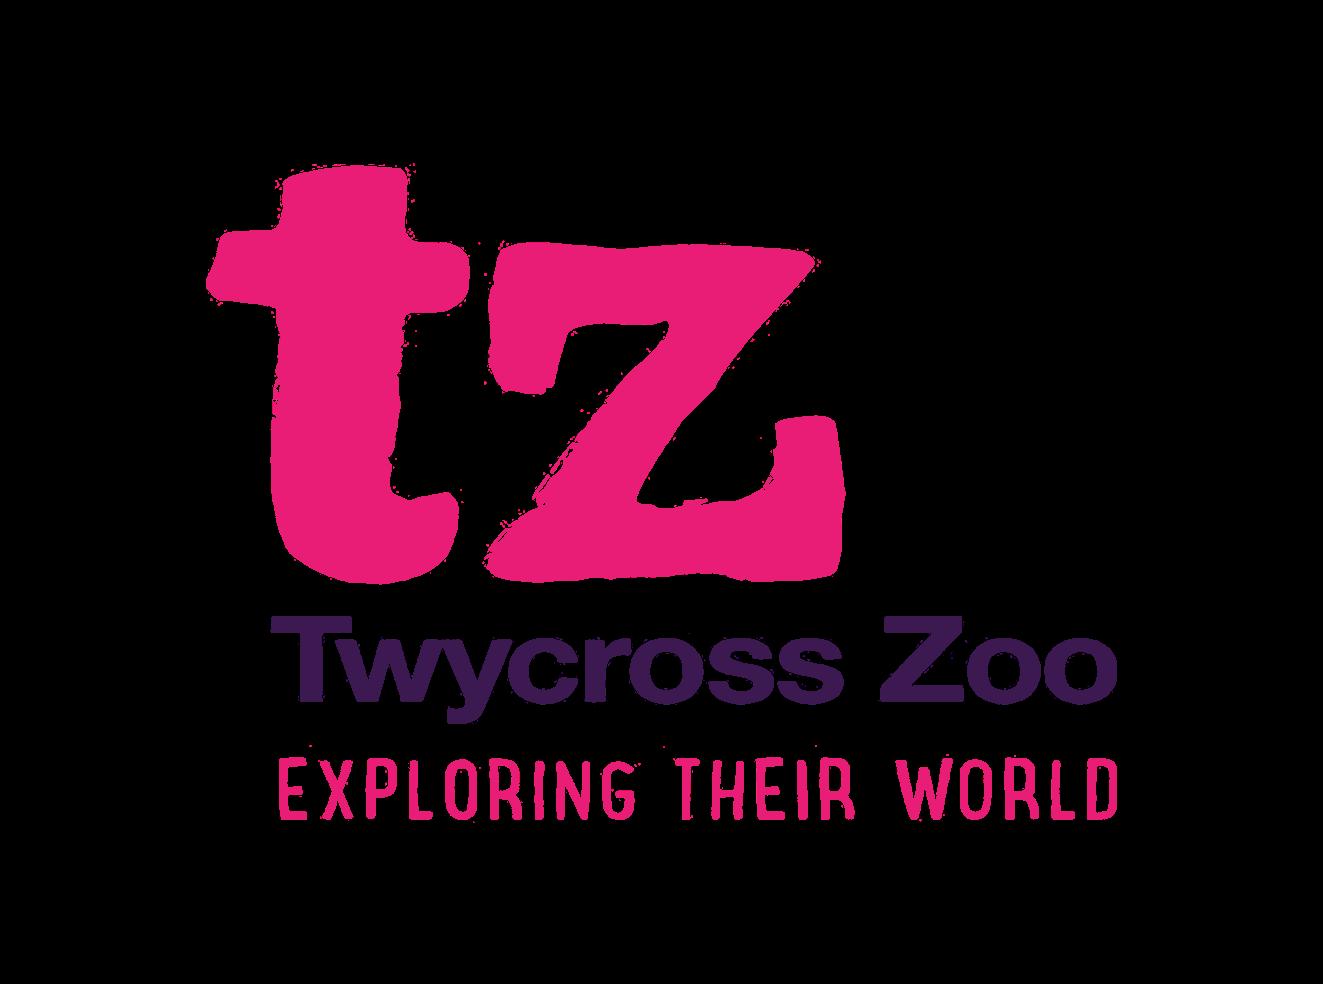 Twycross Zoo Senior